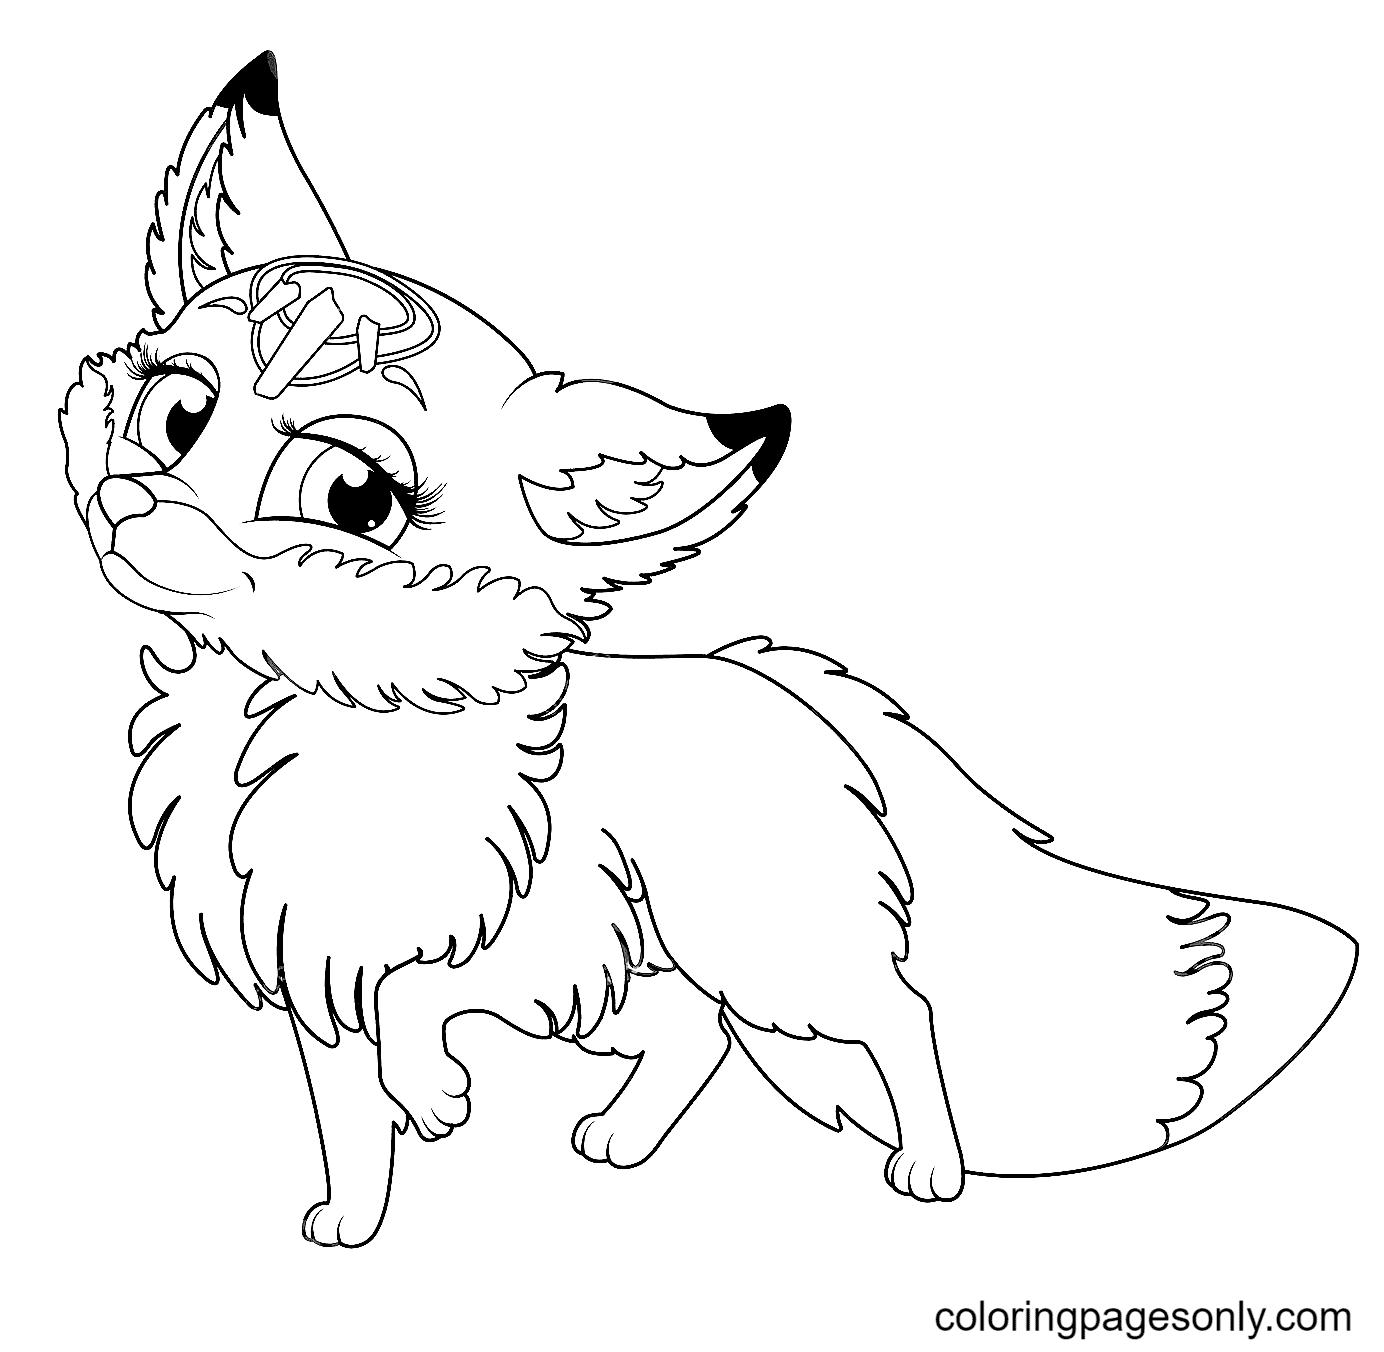 Charming Princess Fox Coloring Page